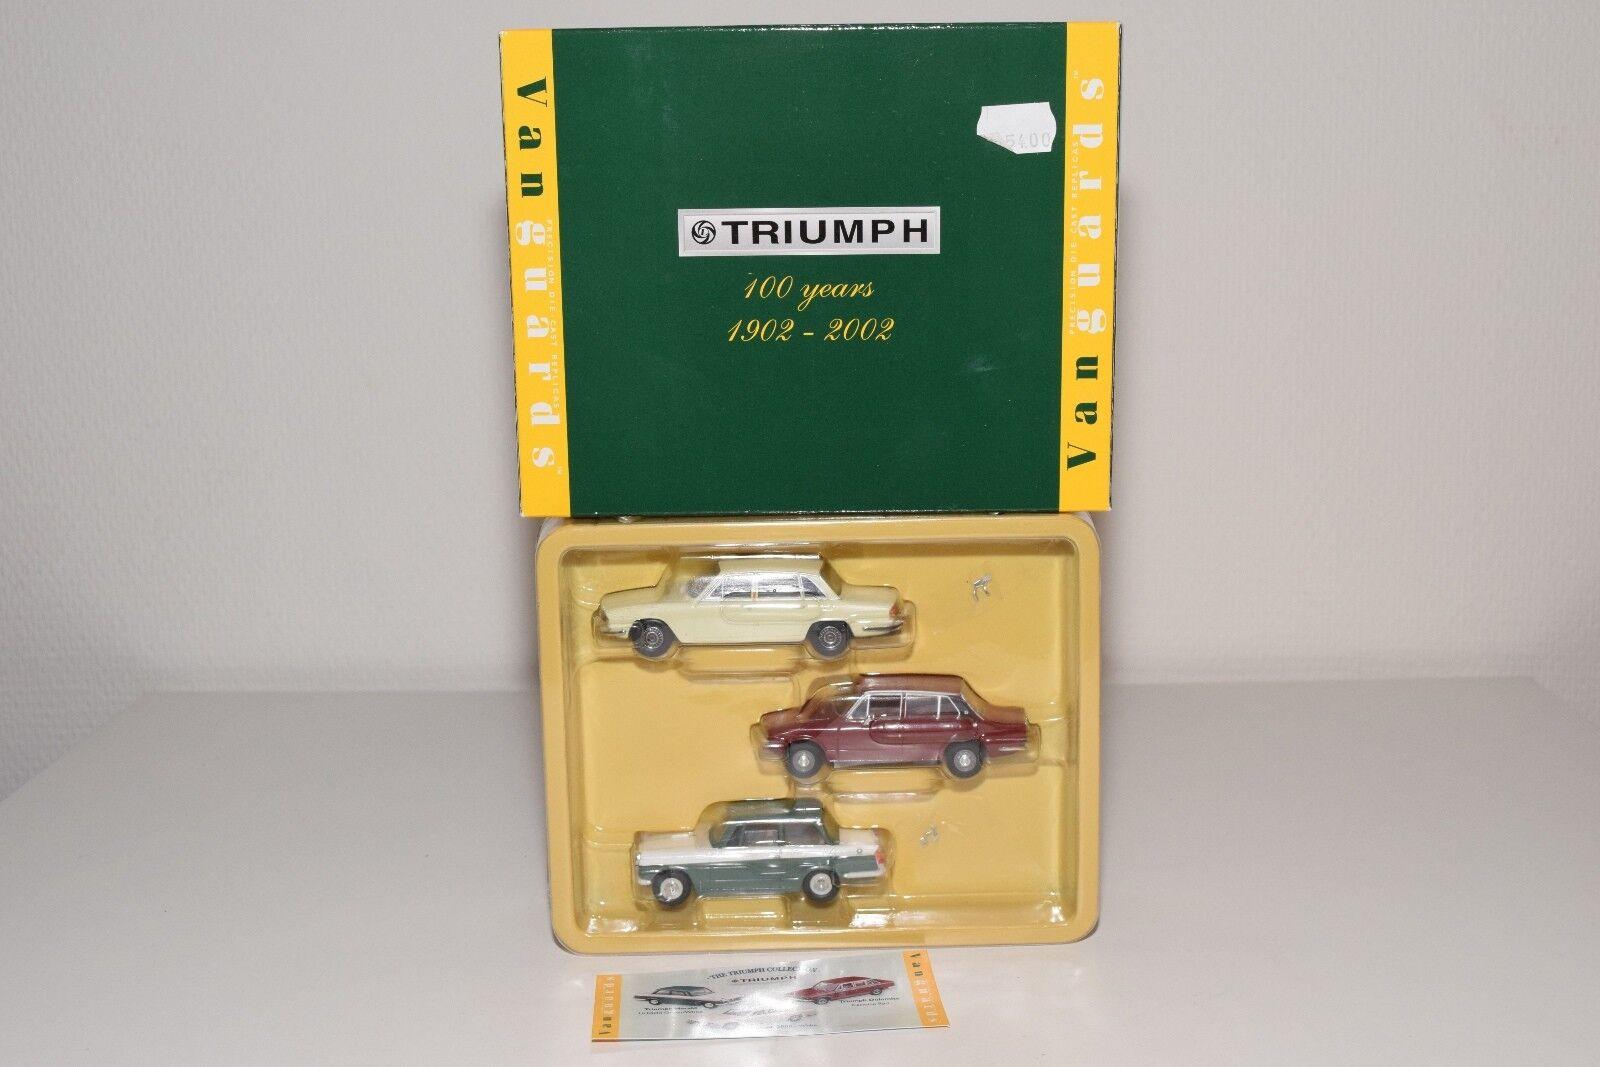 VANGUARDS GIFT SET TC1003 TRIUMPH 100 YEARS DOLOMITE 2000 HERALD MINT BOXED